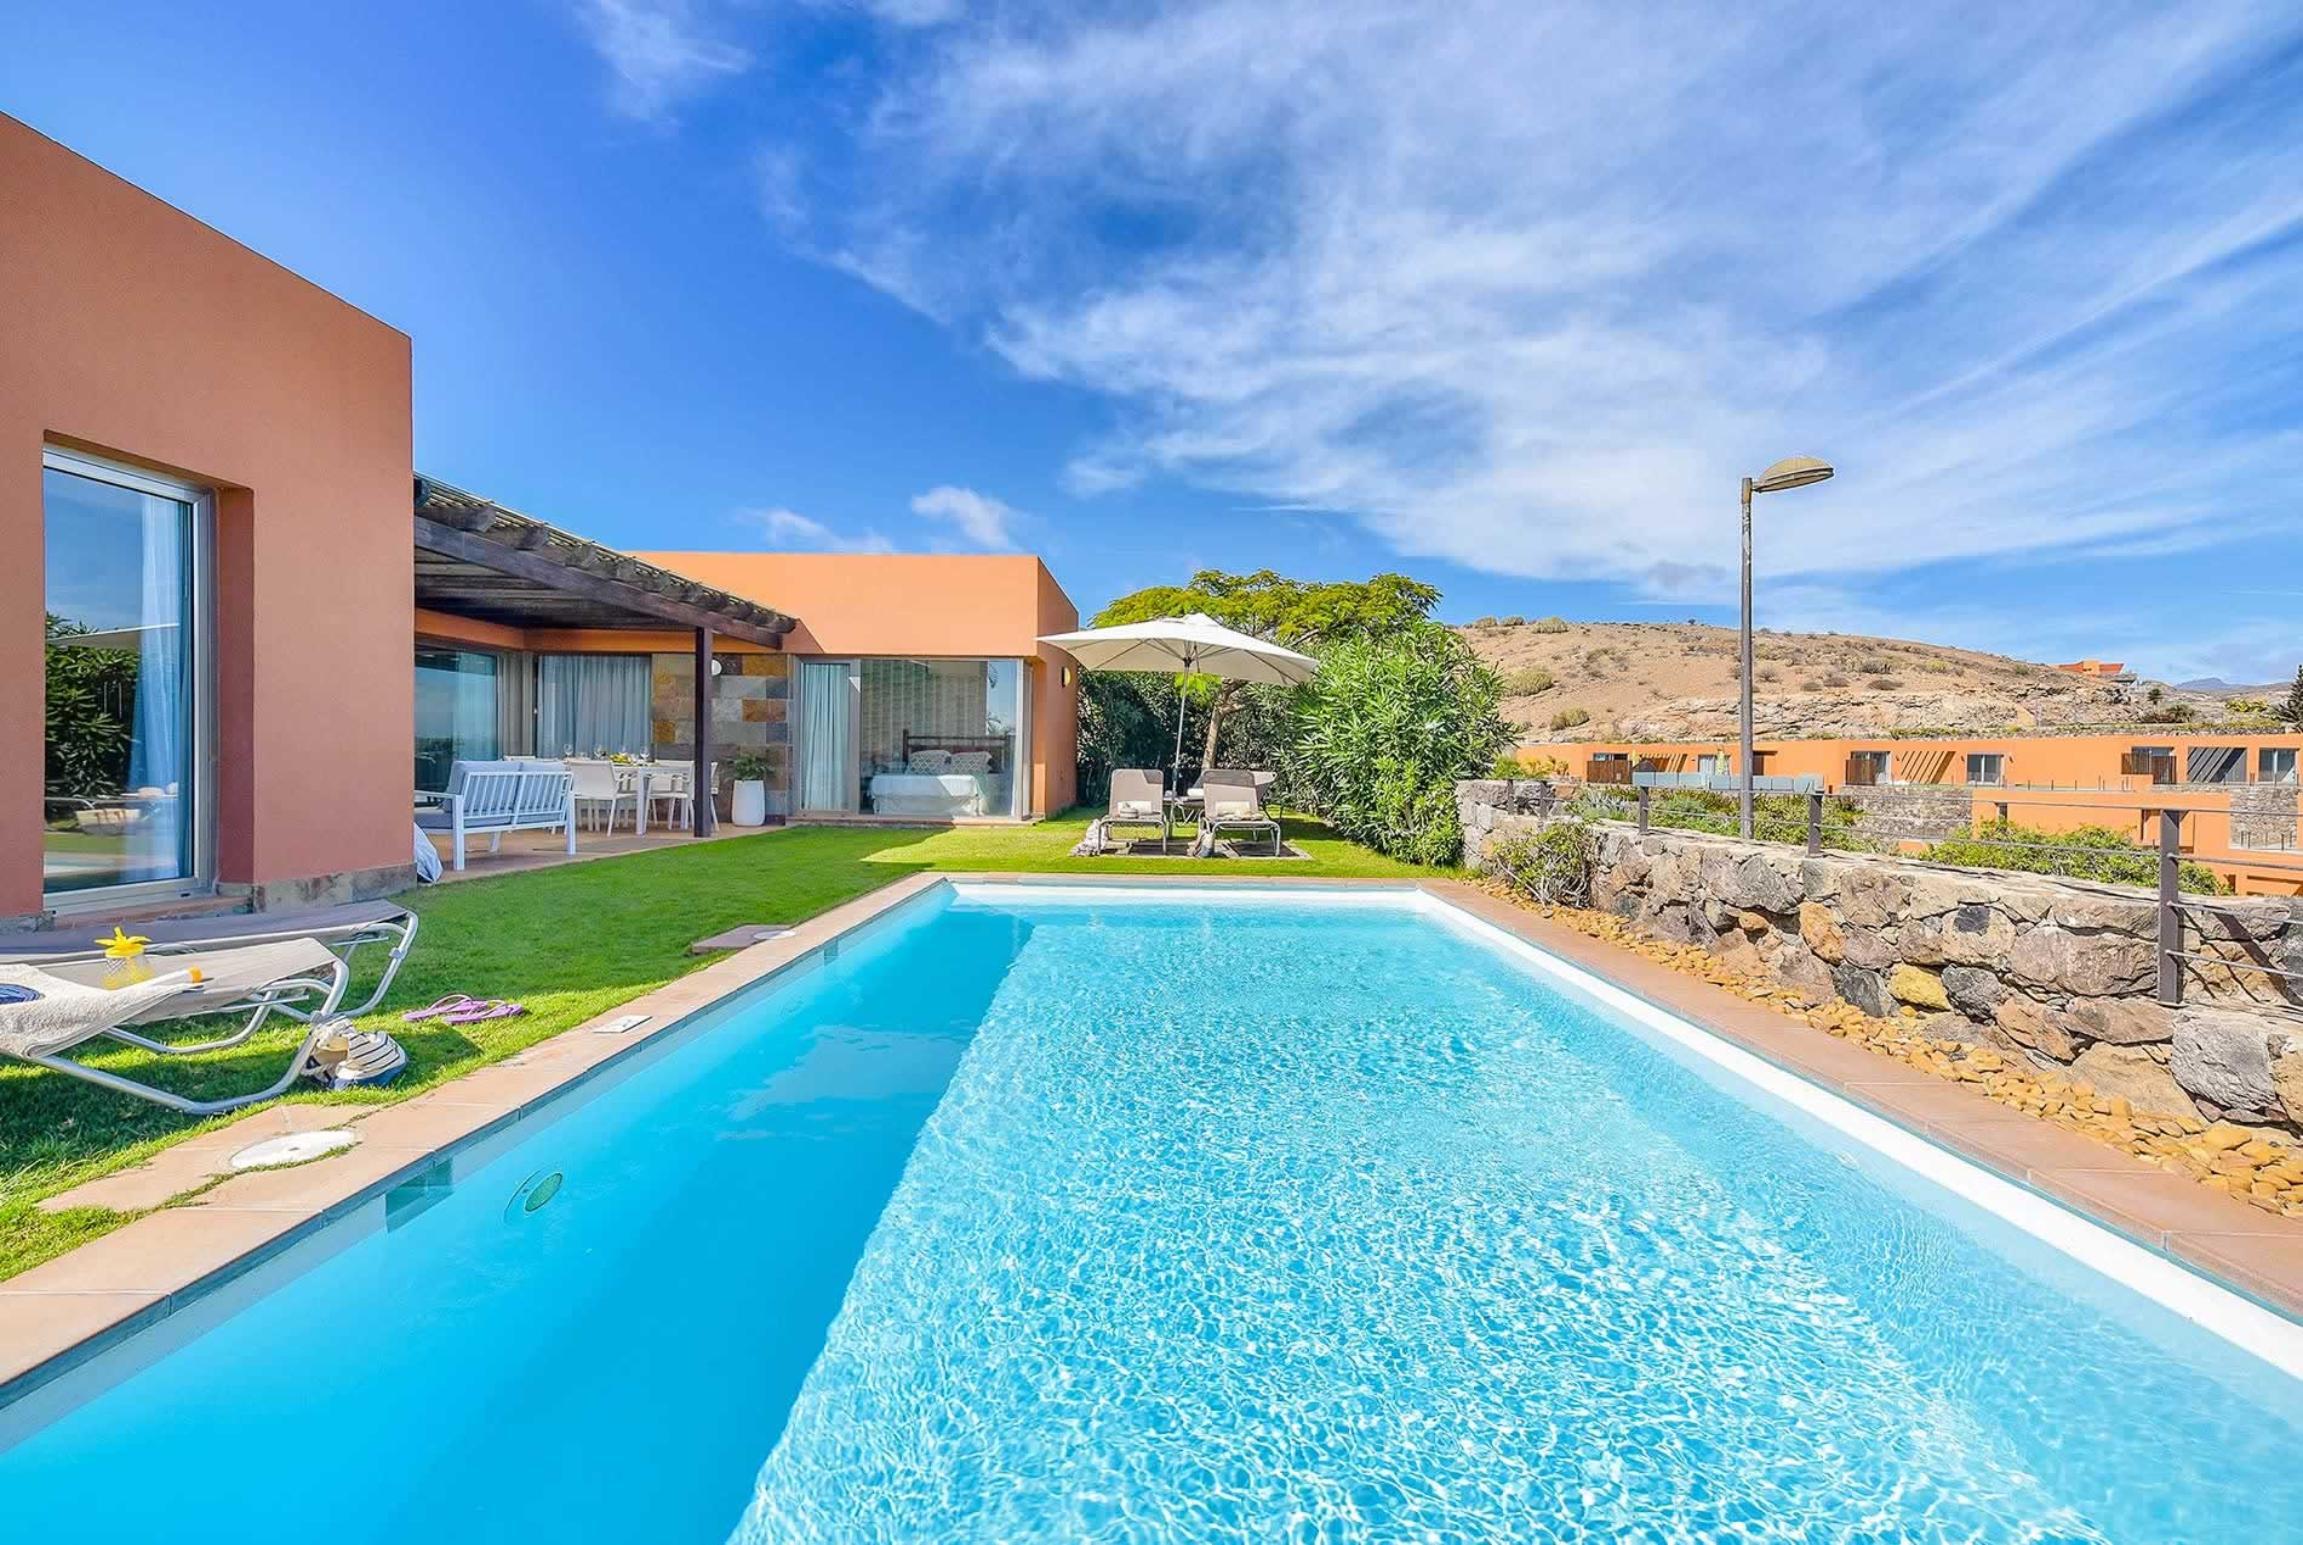 Holiday house Par 4 Villa 21 (2654431), Maspalomas, Gran Canaria, Canary Islands, Spain, picture 22